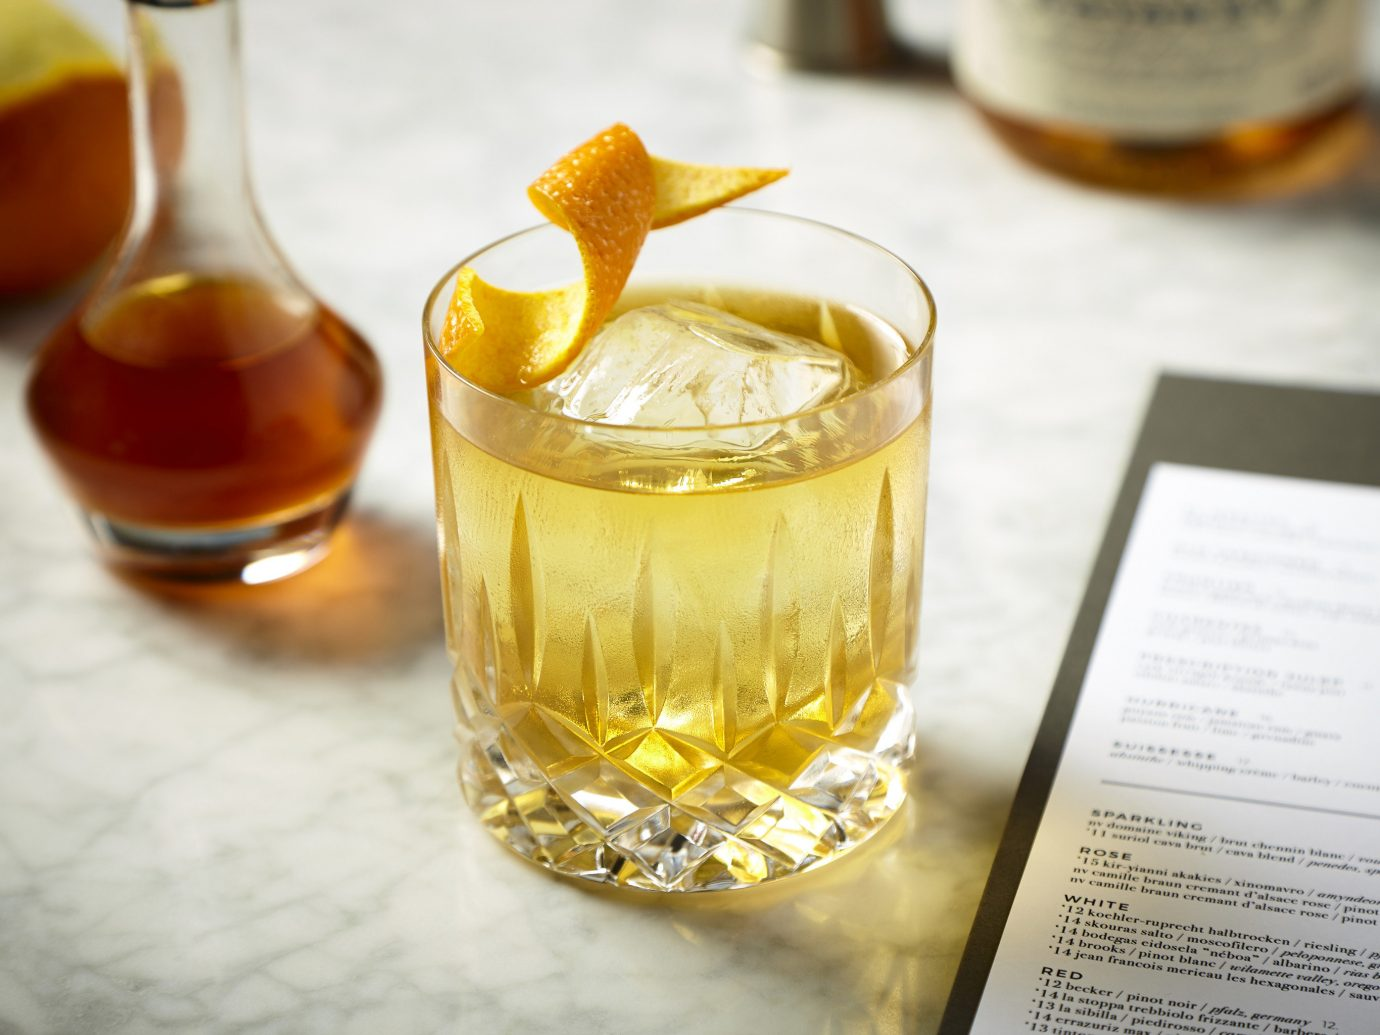 Trip Ideas cup table glass Drink alcoholic beverage distilled beverage whisky liqueur food beverage alcohol